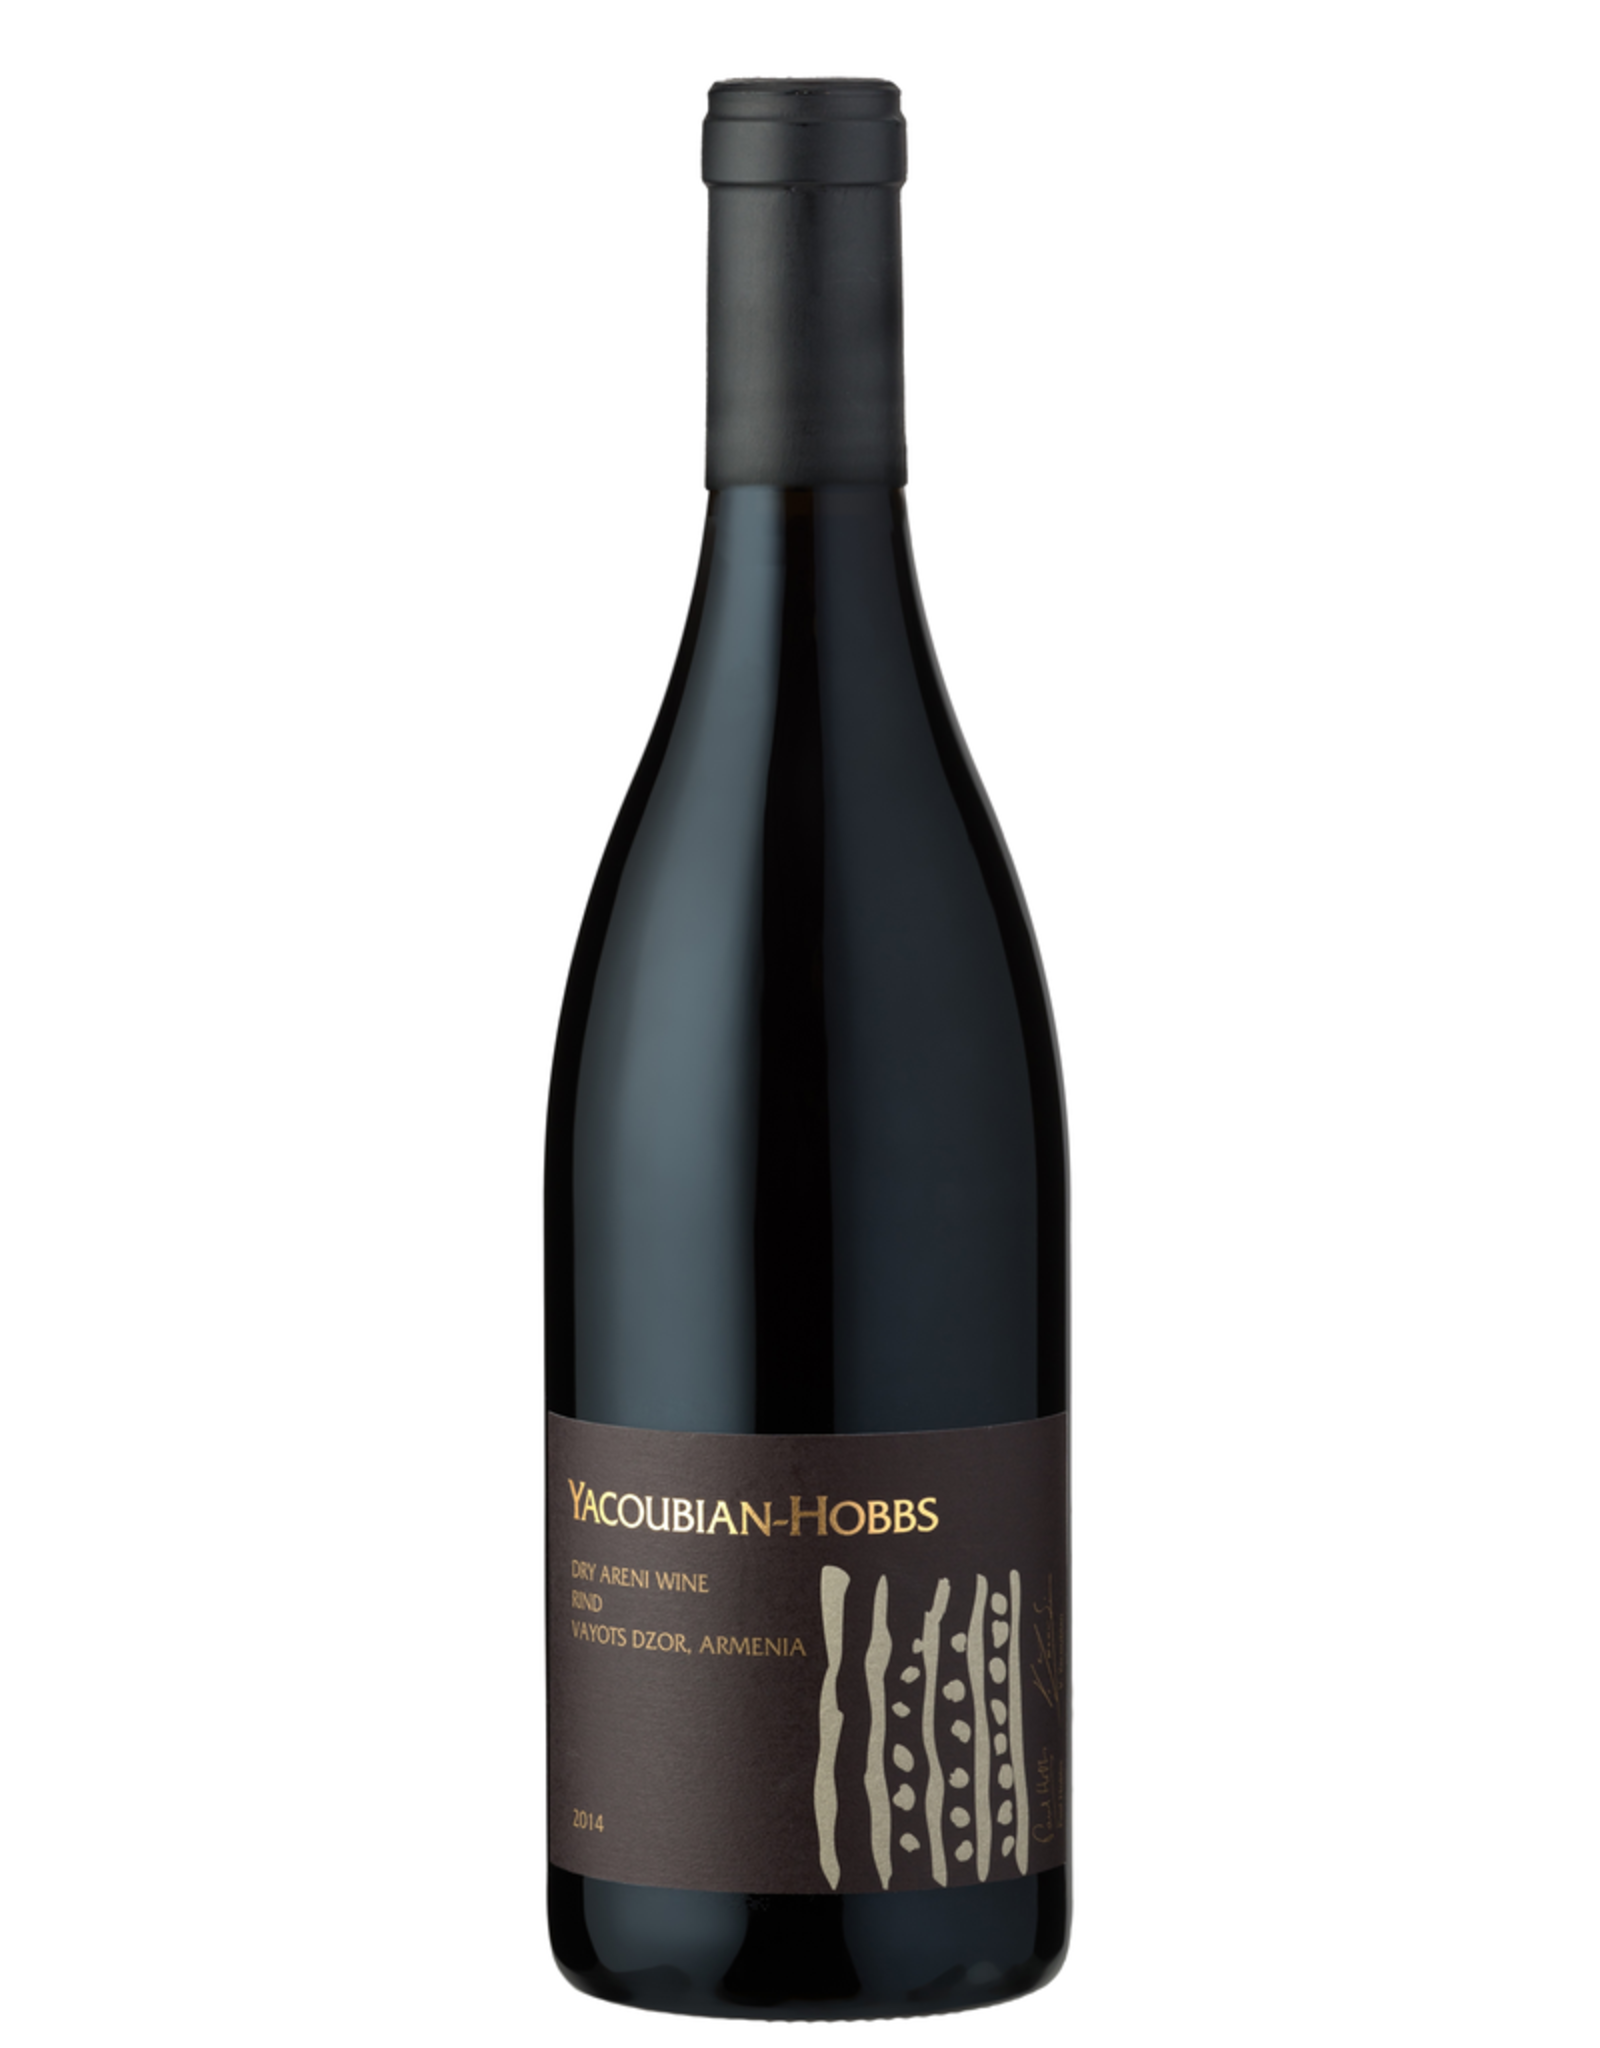 Red Wine 2016, Yacoubian & Paul Hobbs ARENI, Areni Noir, Rind, Vayots Dzor, Armenia, 14% Alc, CTnr, TW92